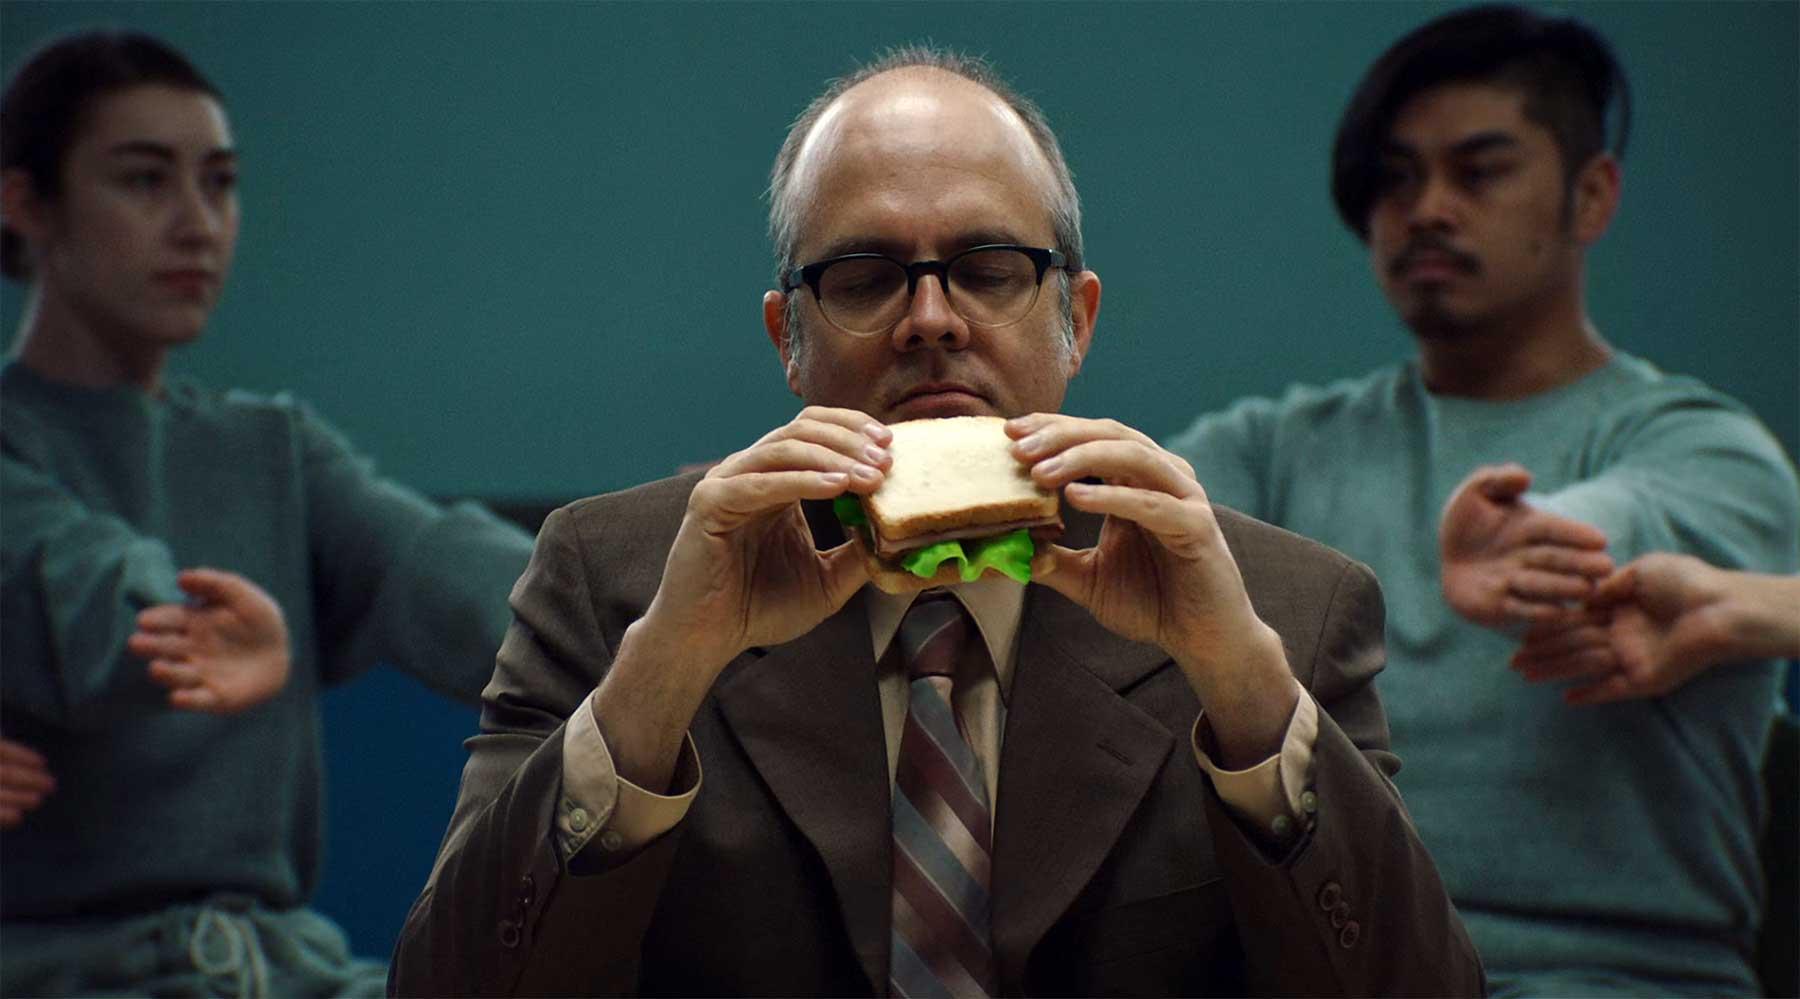 Tanz um dein Sandwich! joe-russo-sandwich-dance